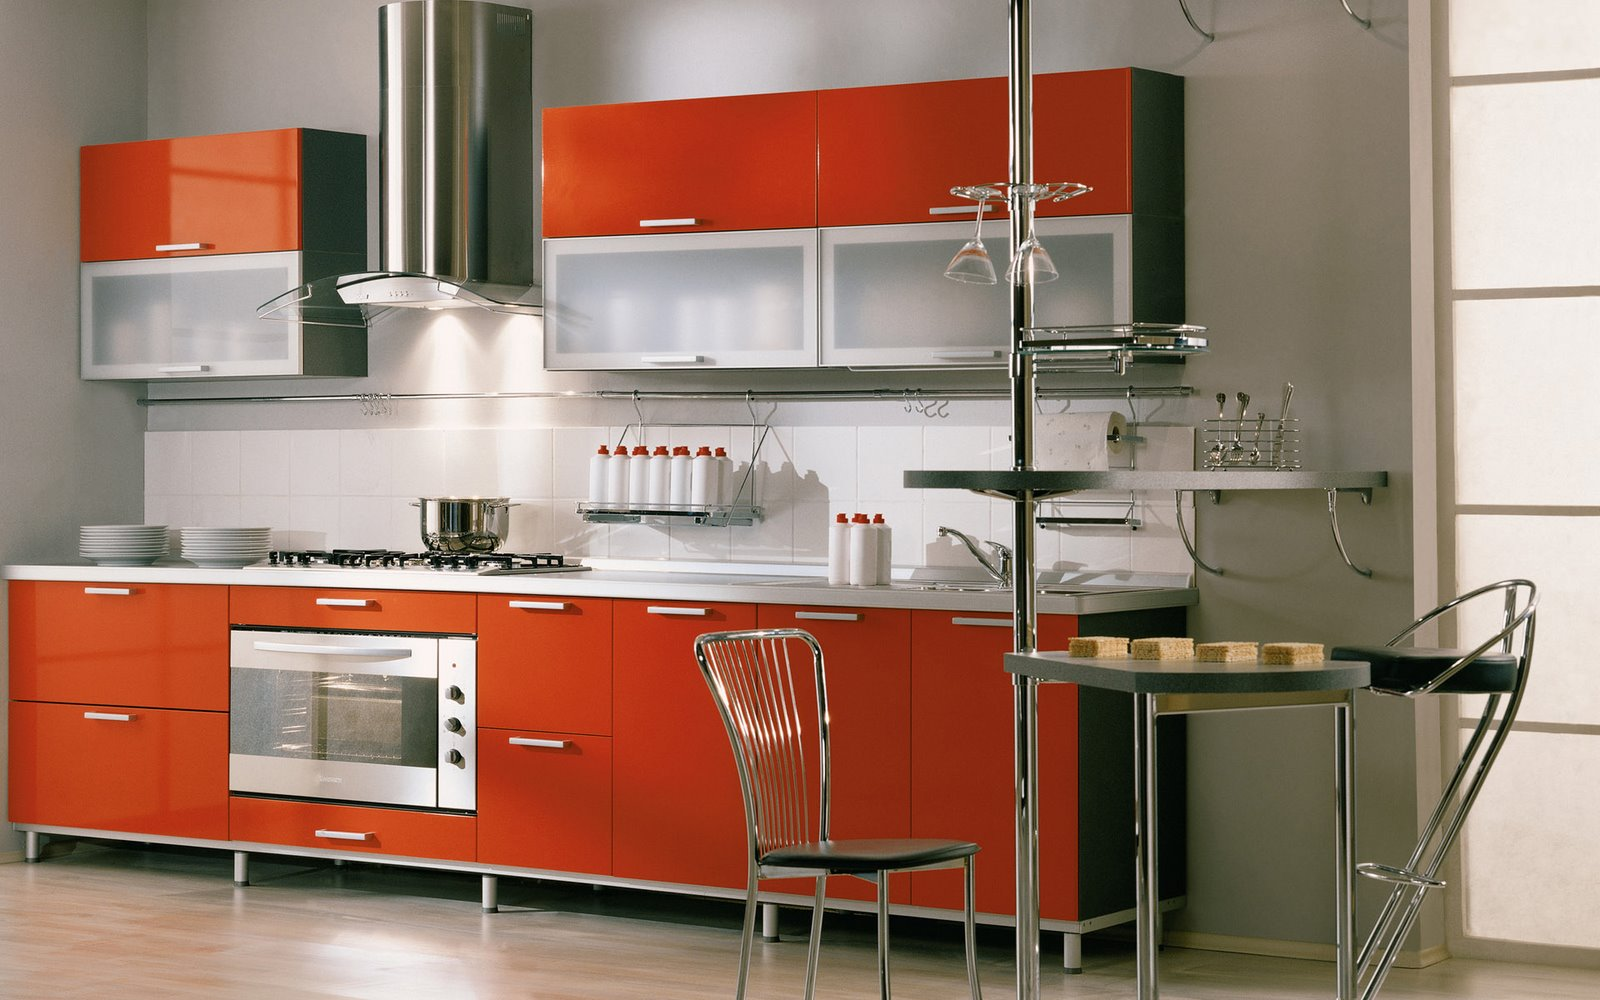 Retro Kitchen Furniture Retro Kitchen Table Retro Kitchen Table Set Photo 3 Retro